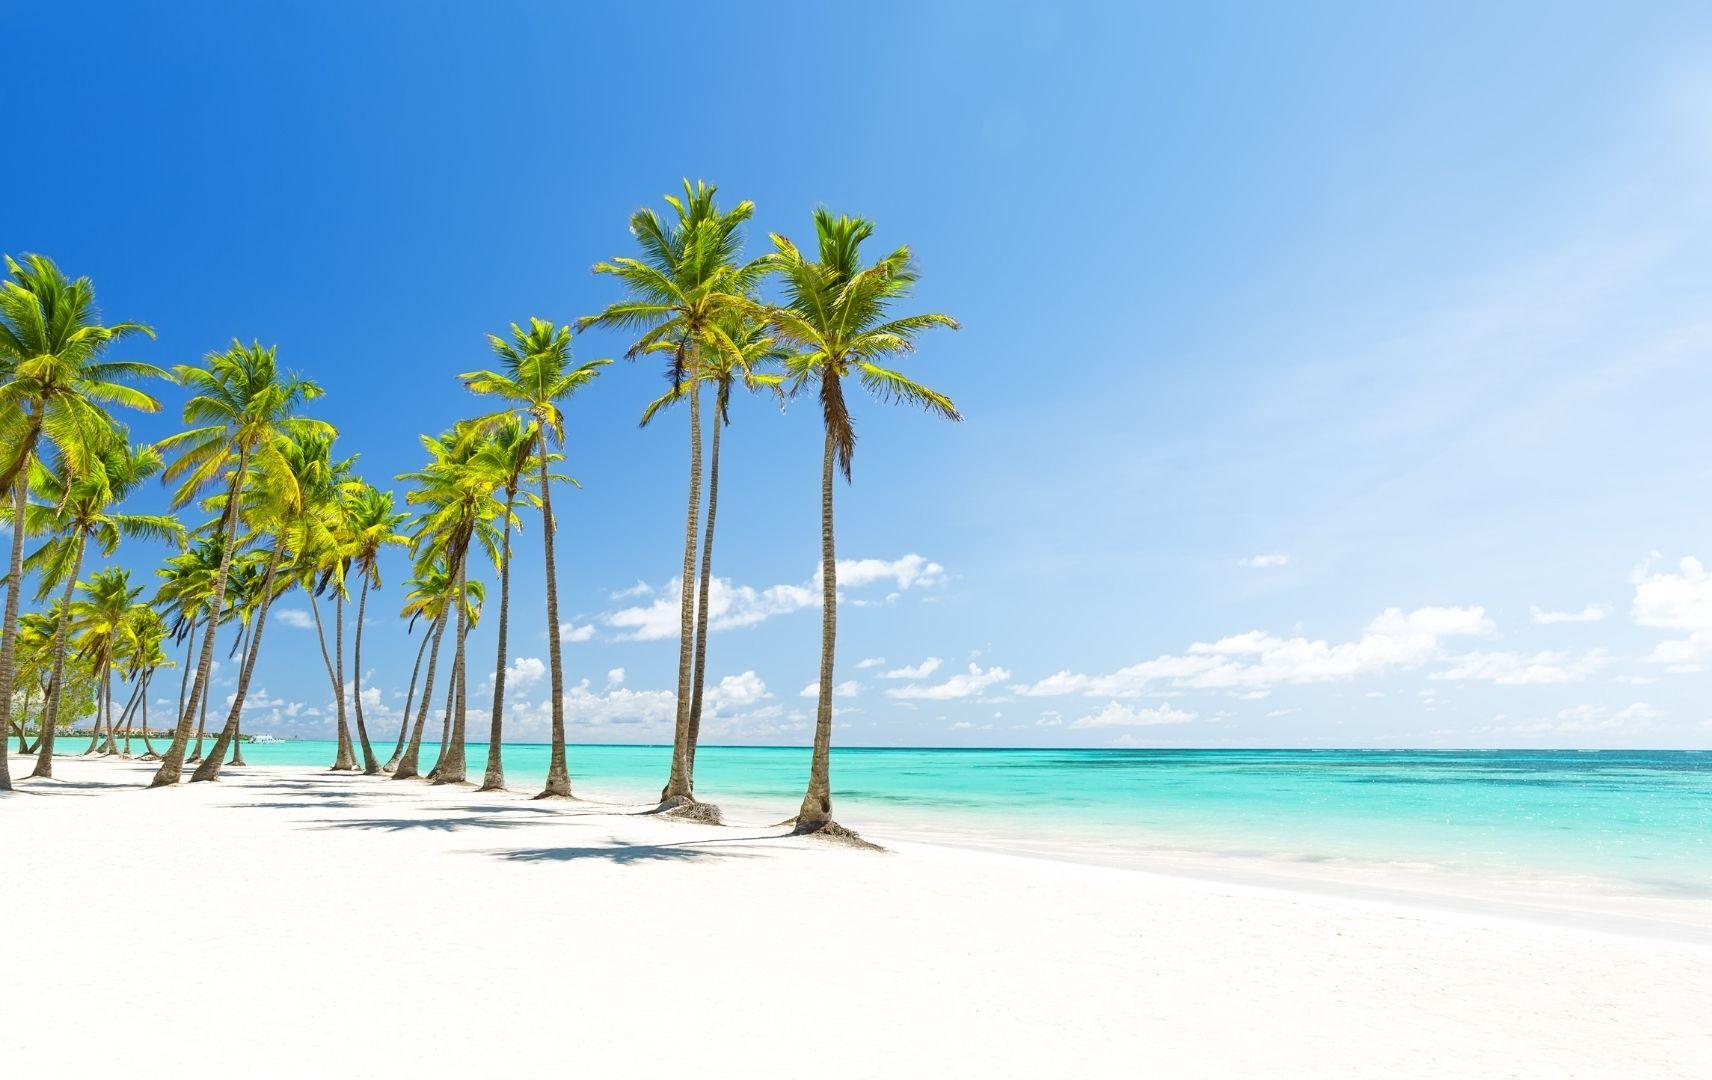 Punta Cana, Strand mit Palmen